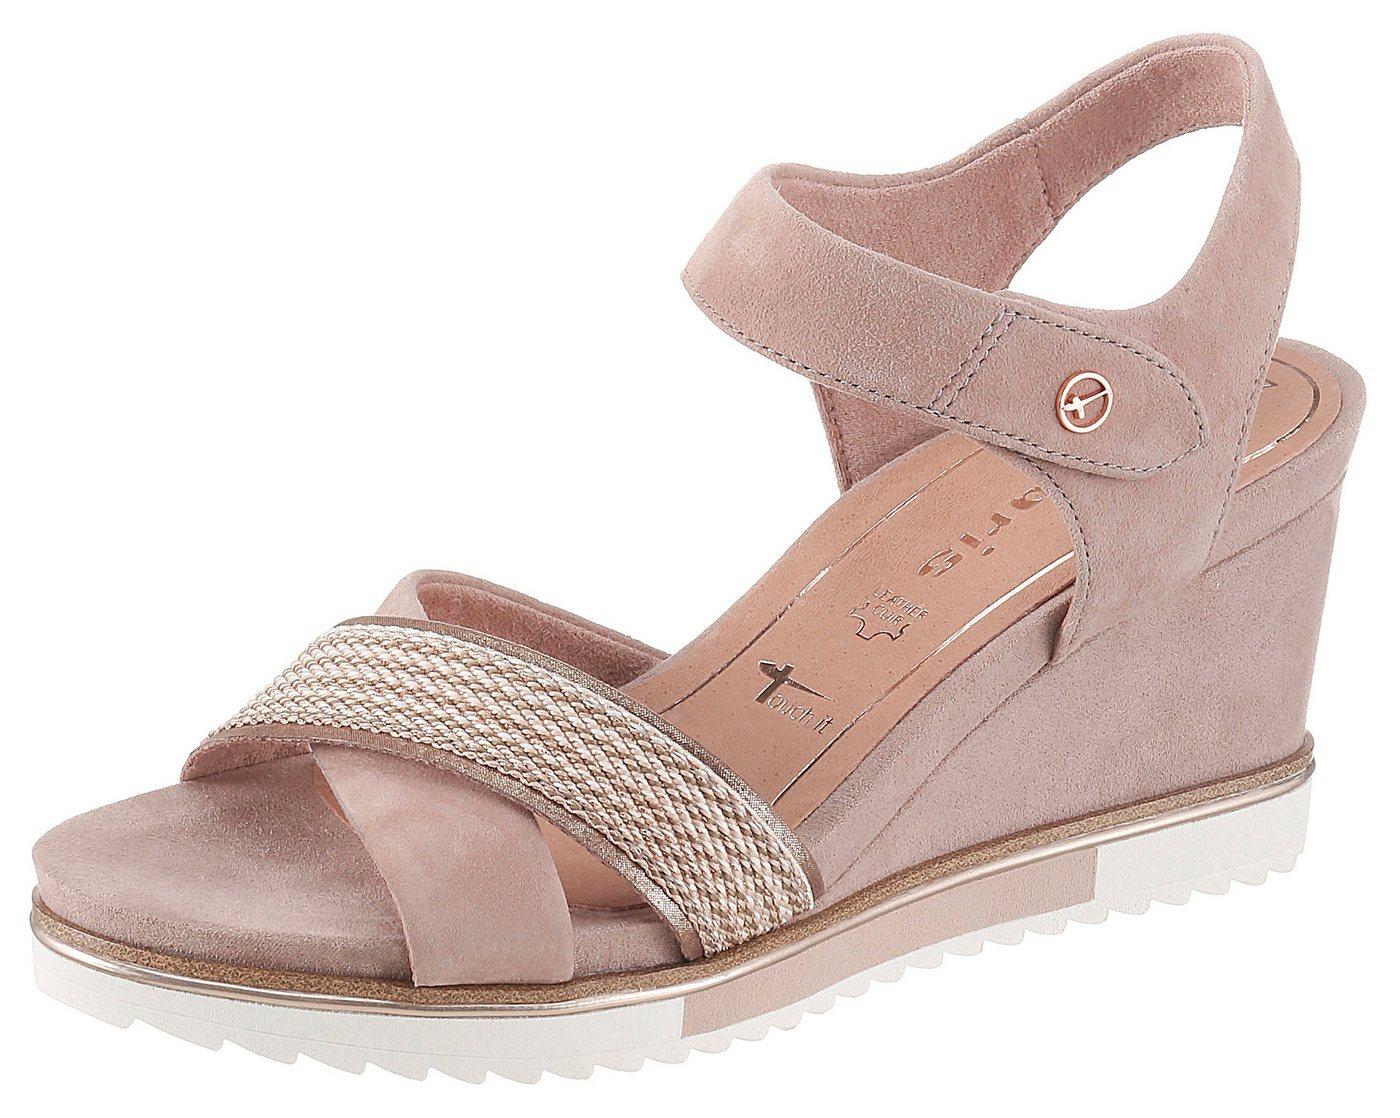 tamaris -  »Alis« Sandalette mit eleganter Kreuzbandage